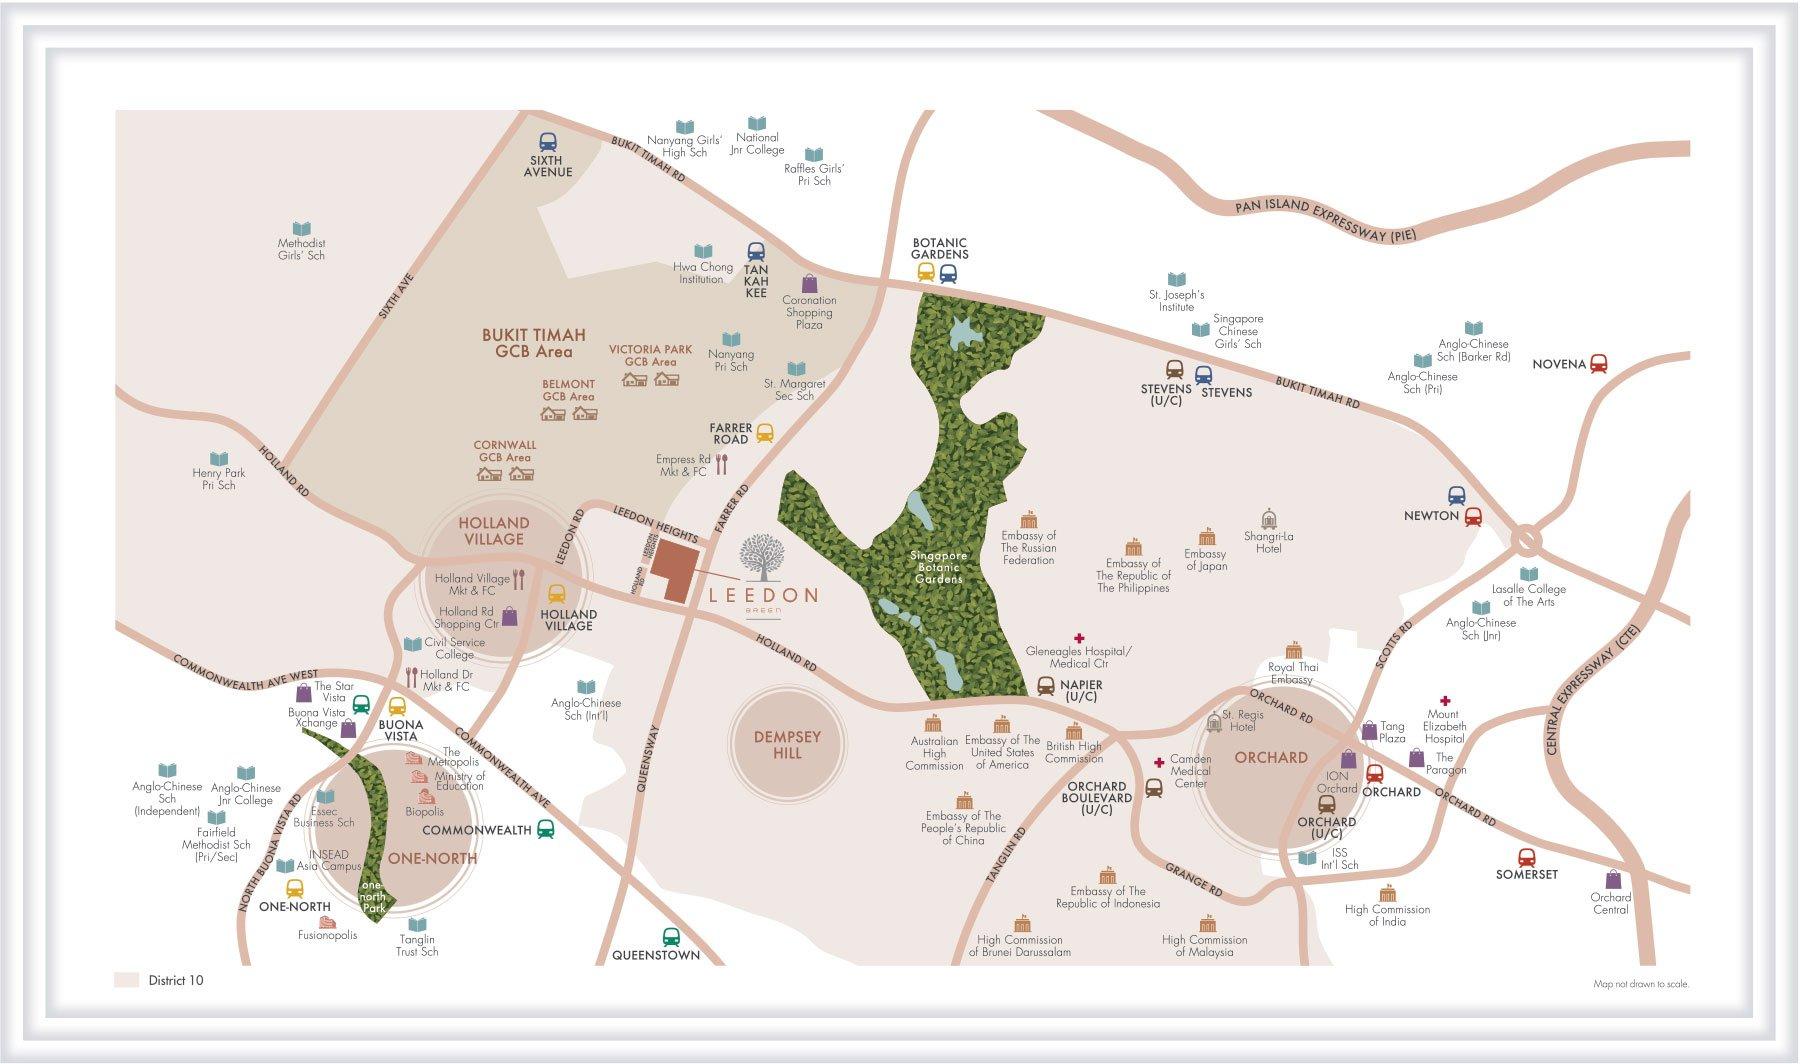 绿墩雅苑地段优越 leedon green location map developer